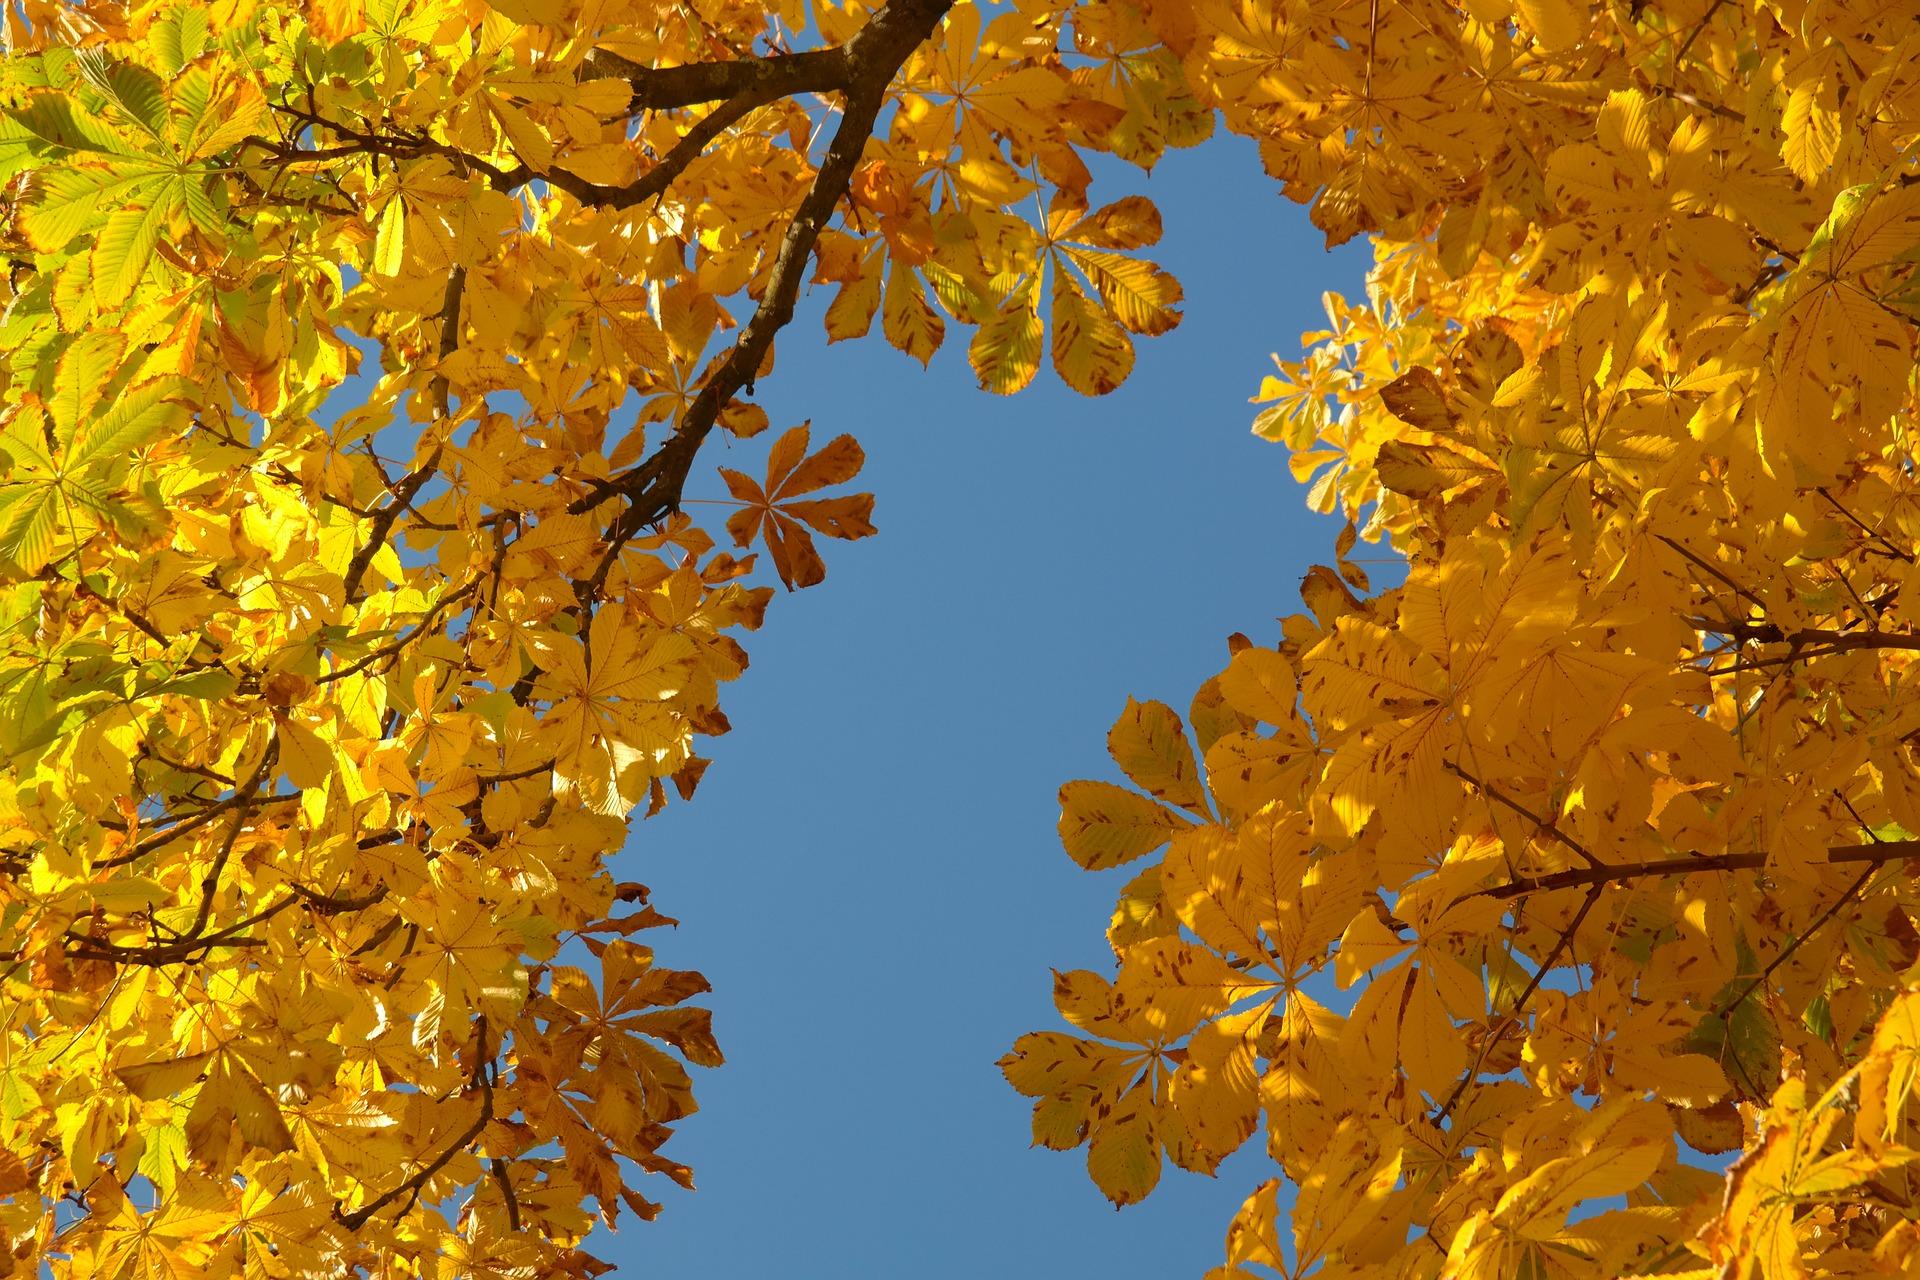 chestnut leaves 228072 1920 - Najpiękniejsze okolice Trójmiasta